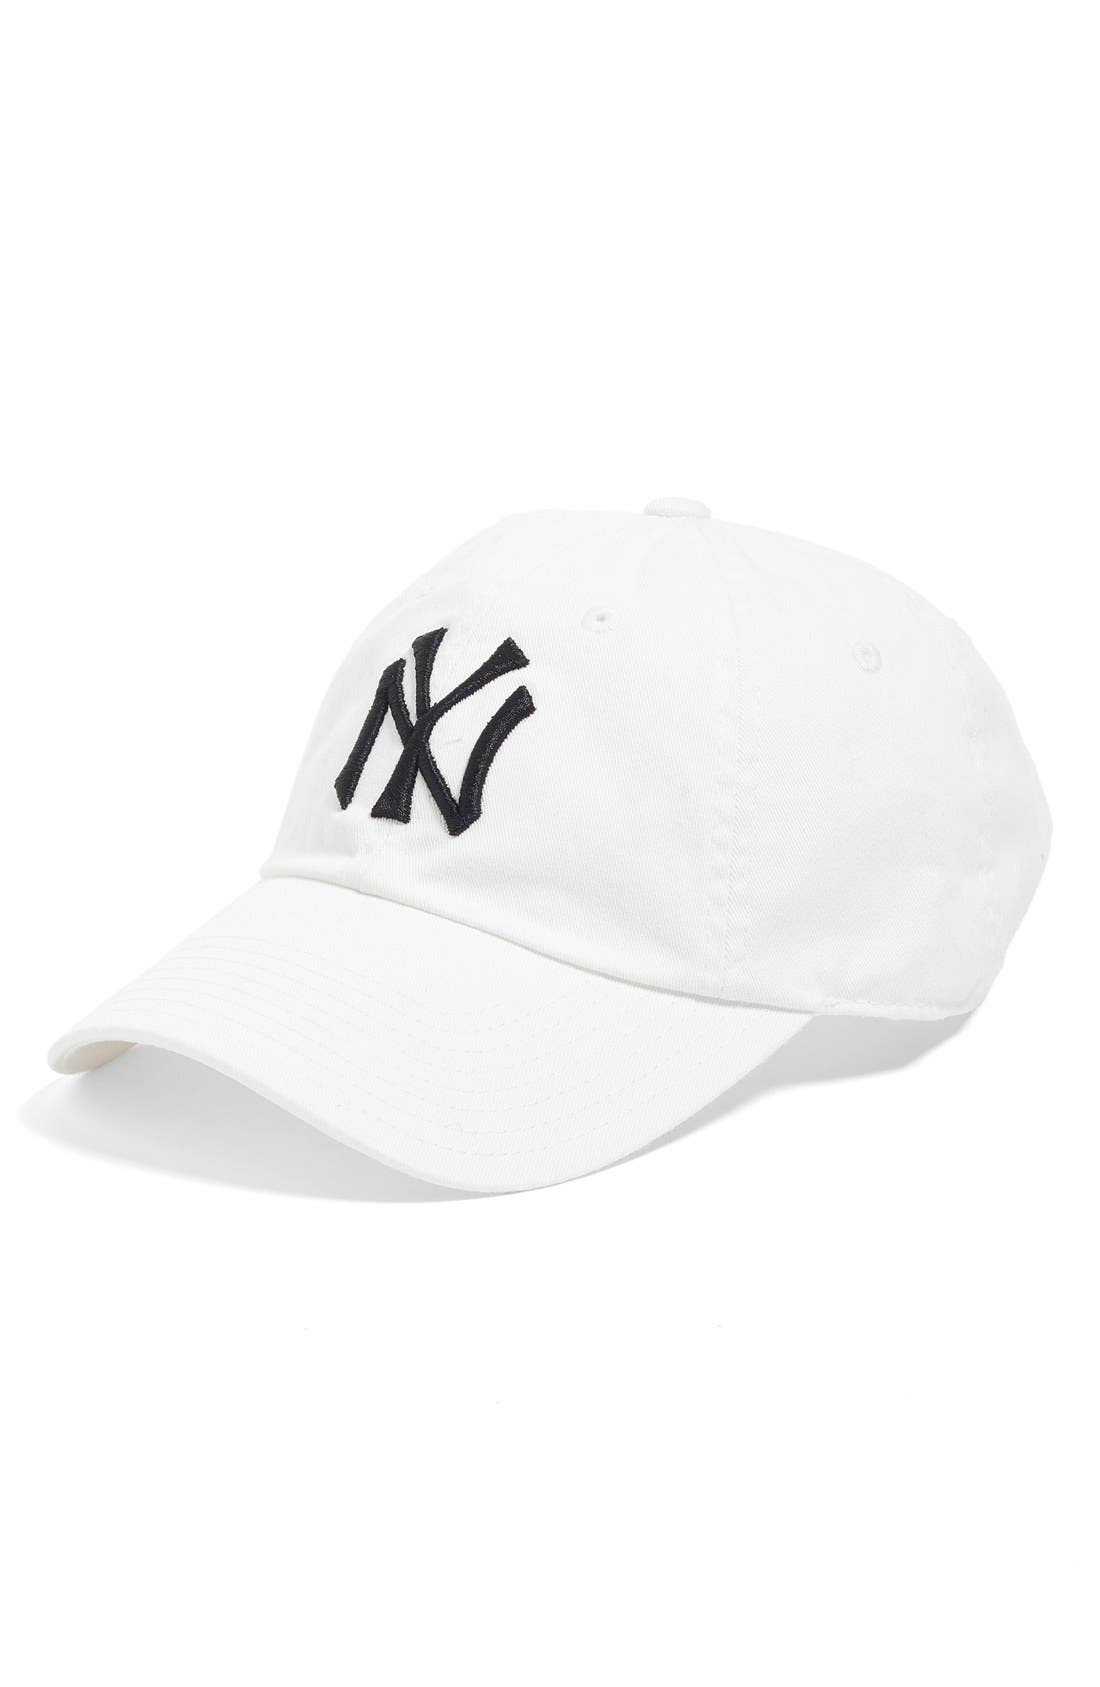 Alternate Image 1 Selected - American Needle 'New York Yankees' Baseball Cap